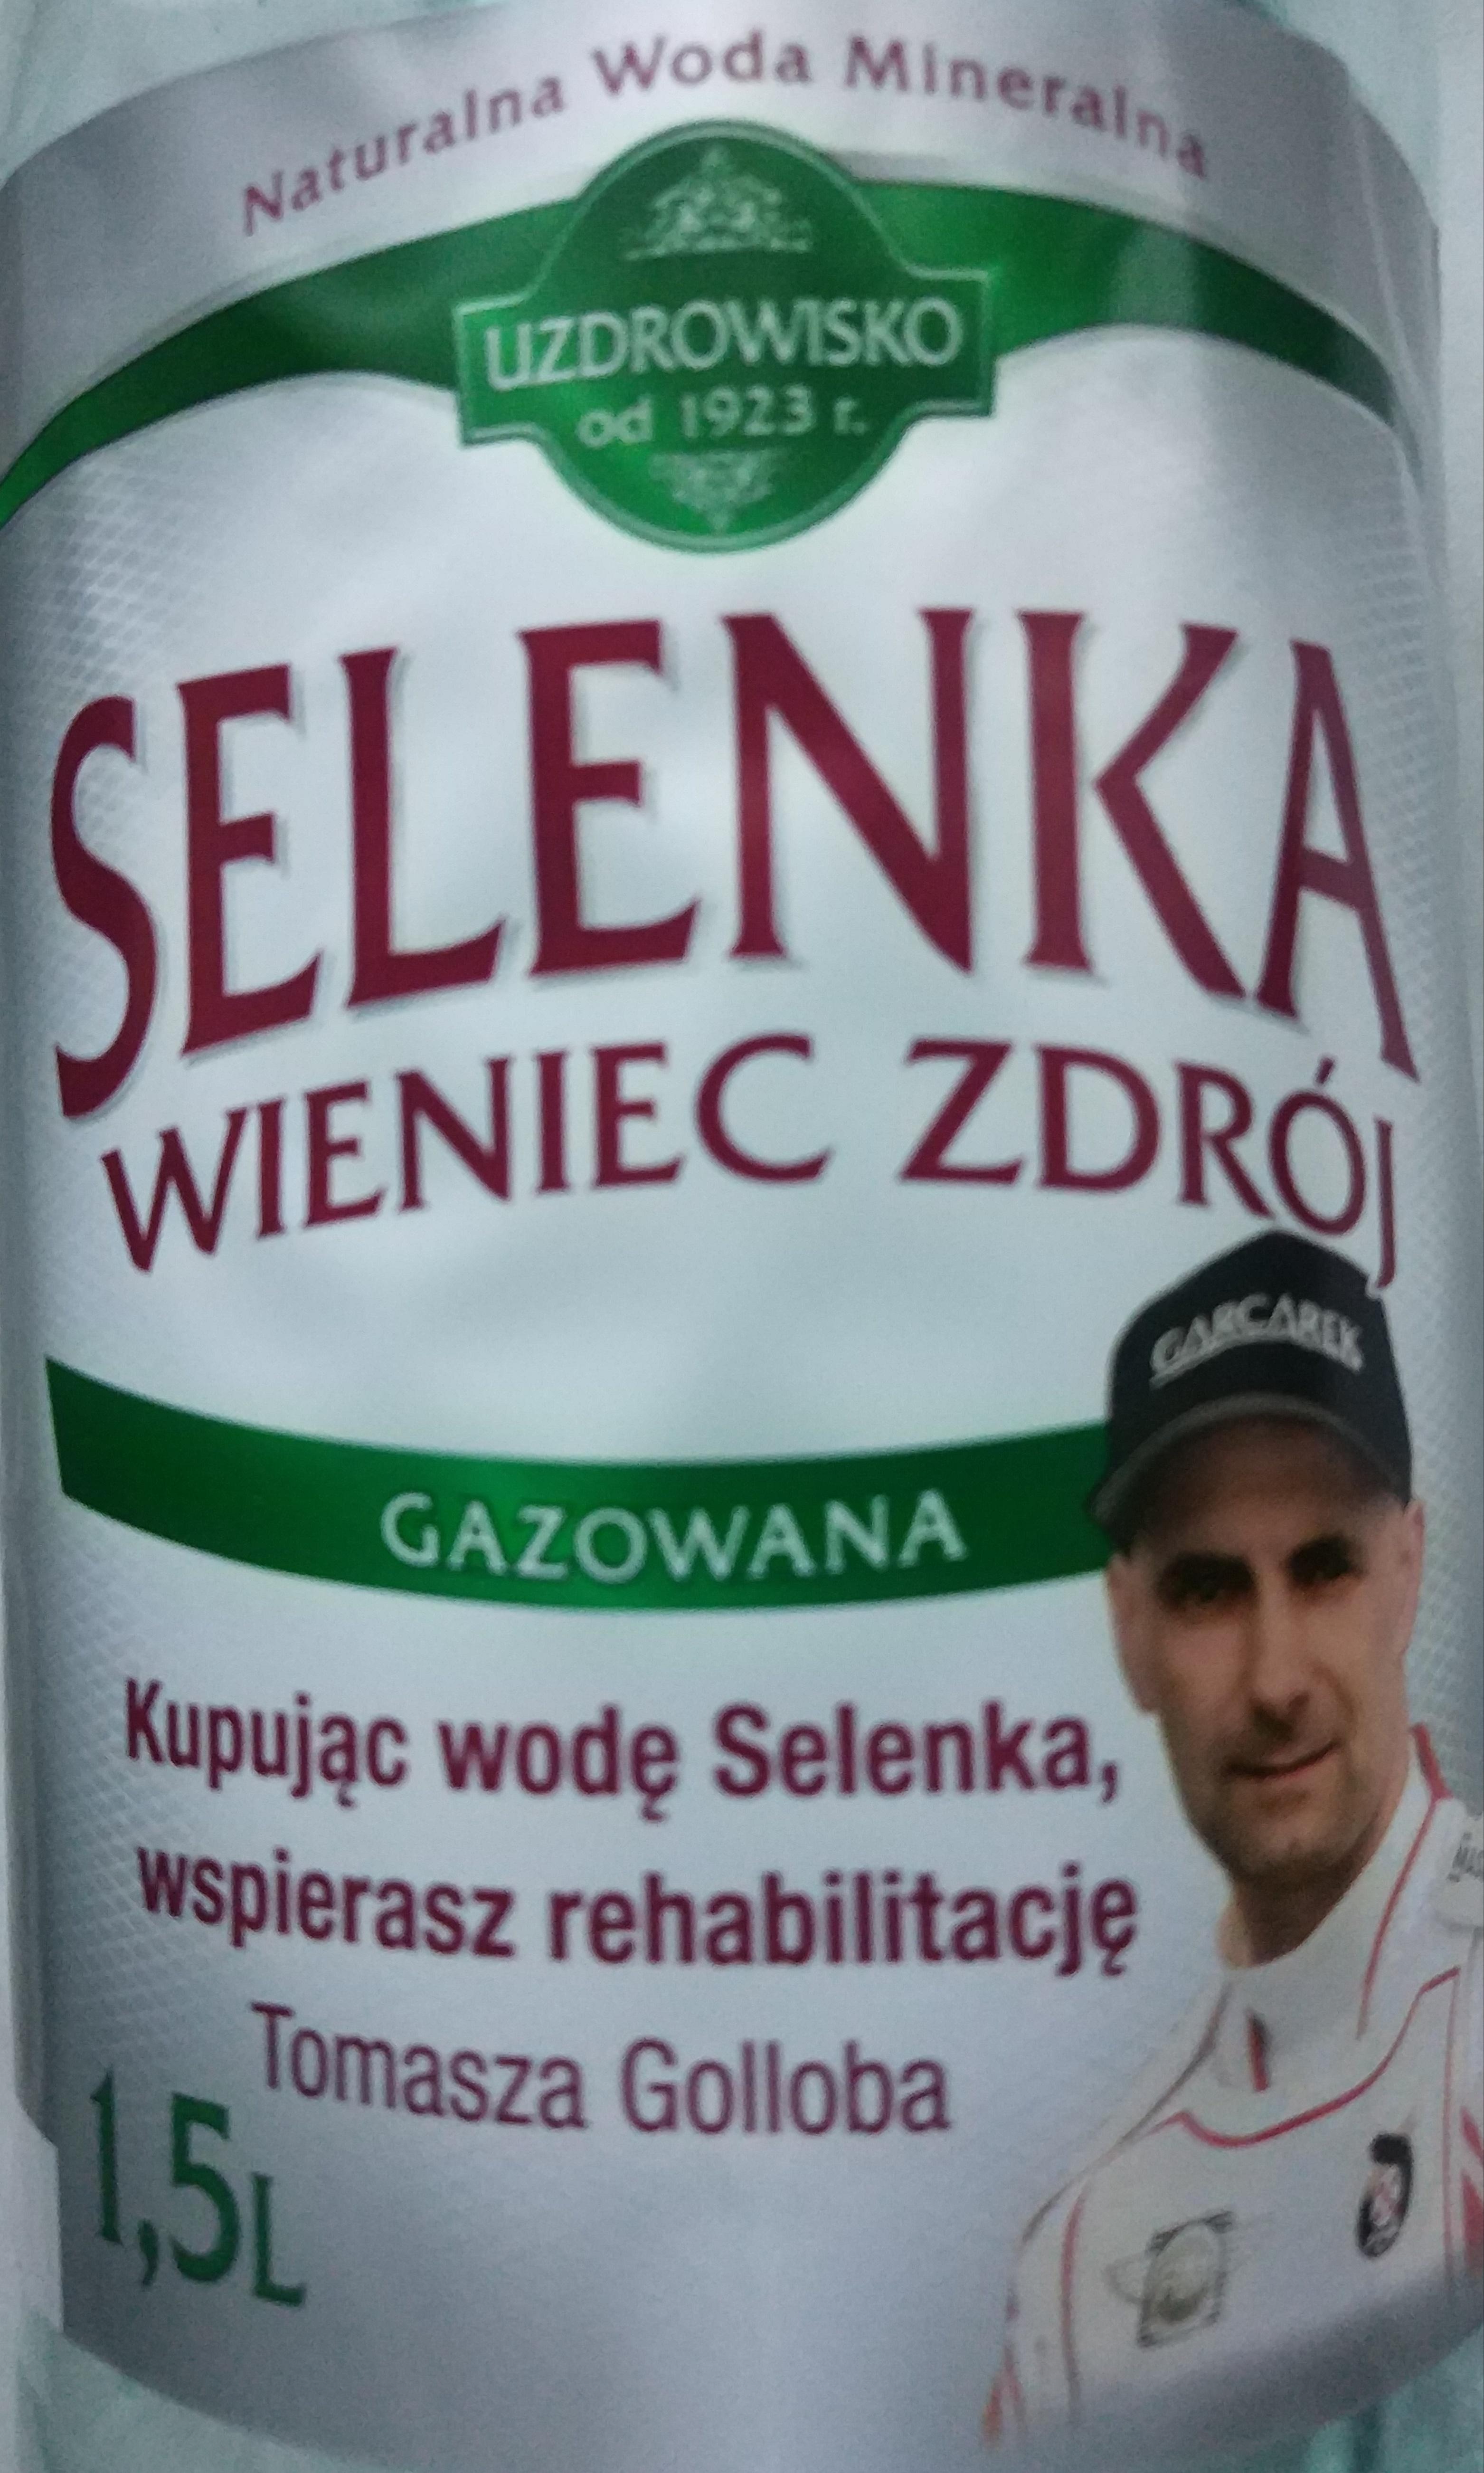 Woda mineralna Selenka 1,5 L Auchan